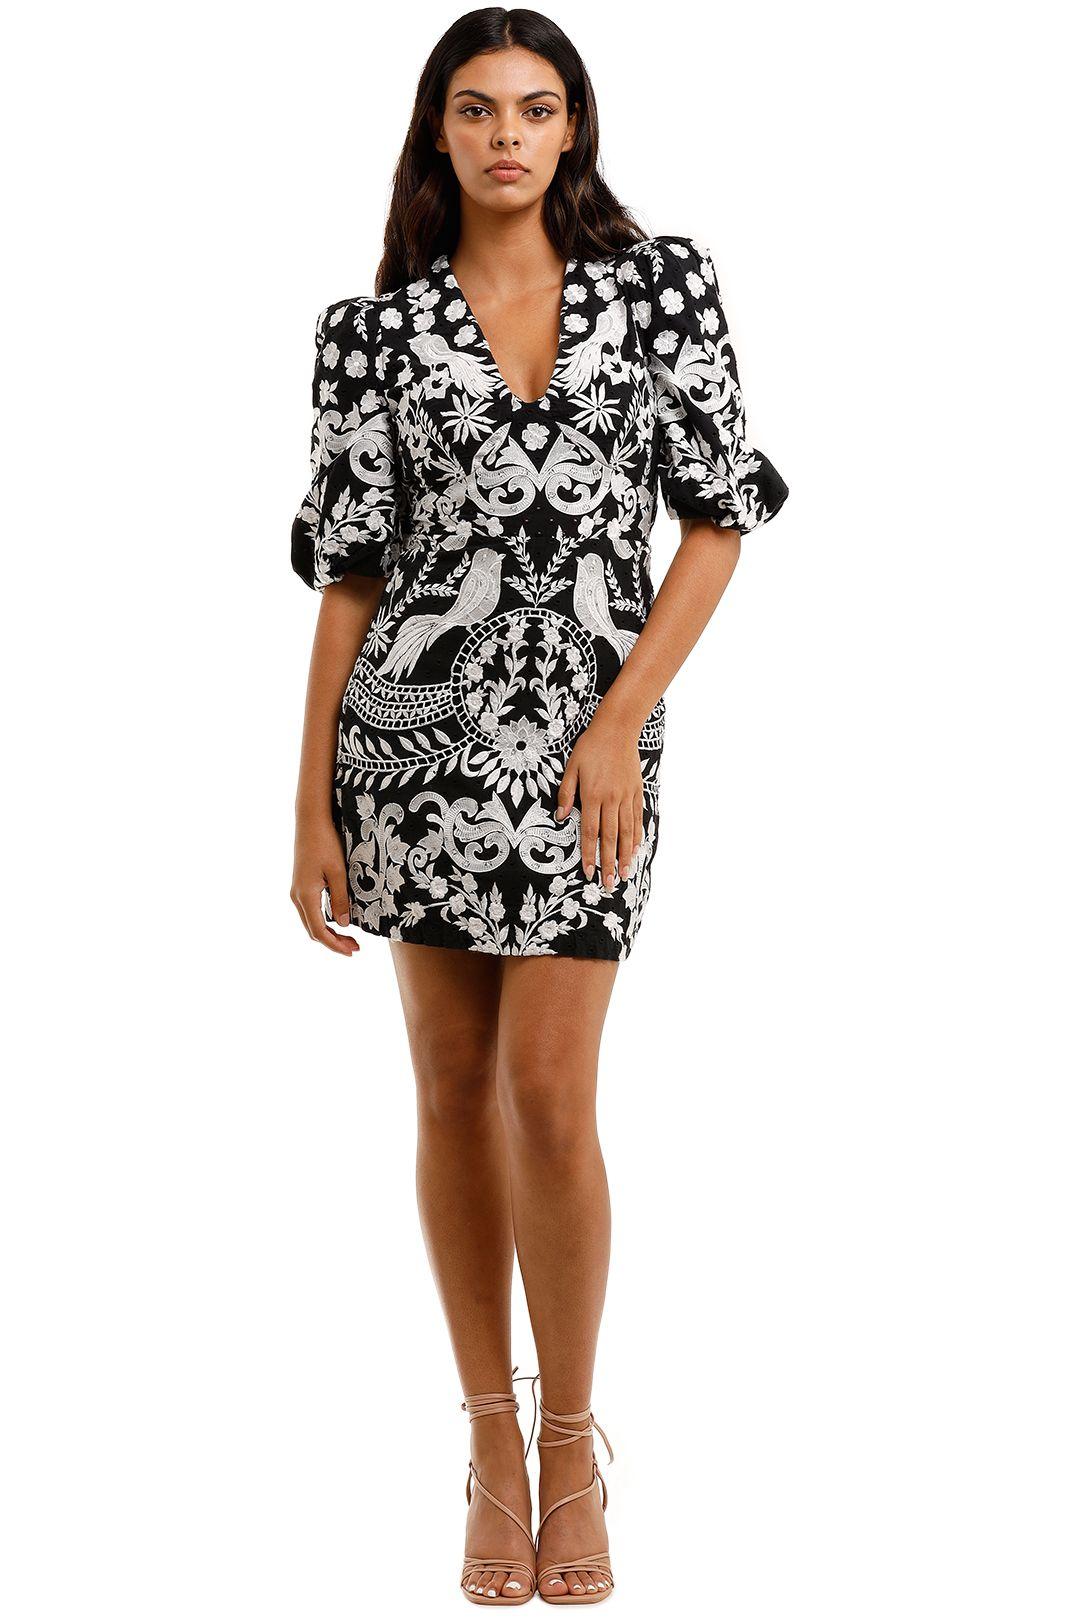 Thurley Enchanted Garden Dress Black puff sleeves